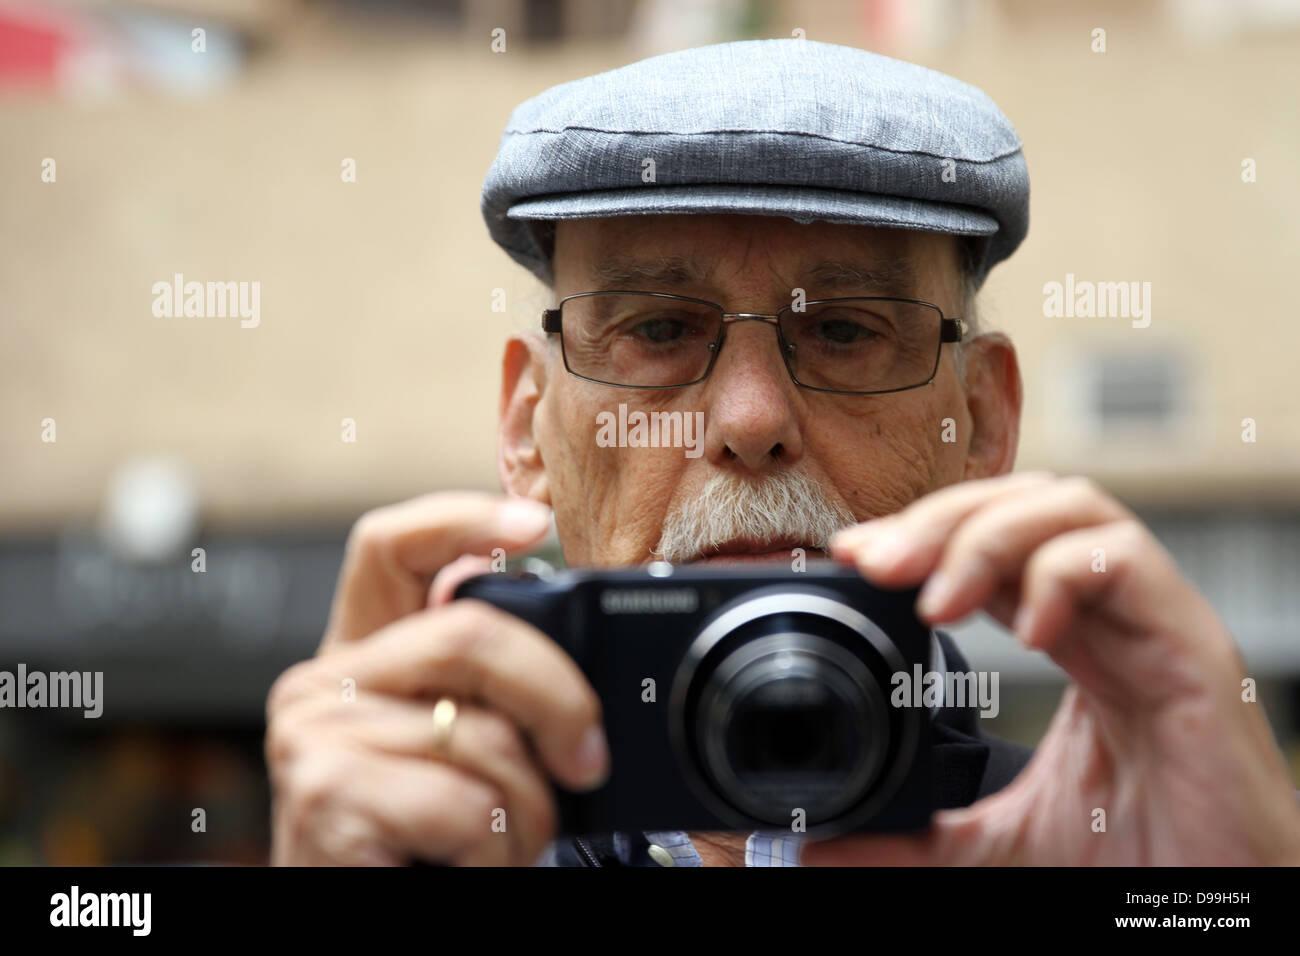 Gentleman holding digital camera - Stock Image